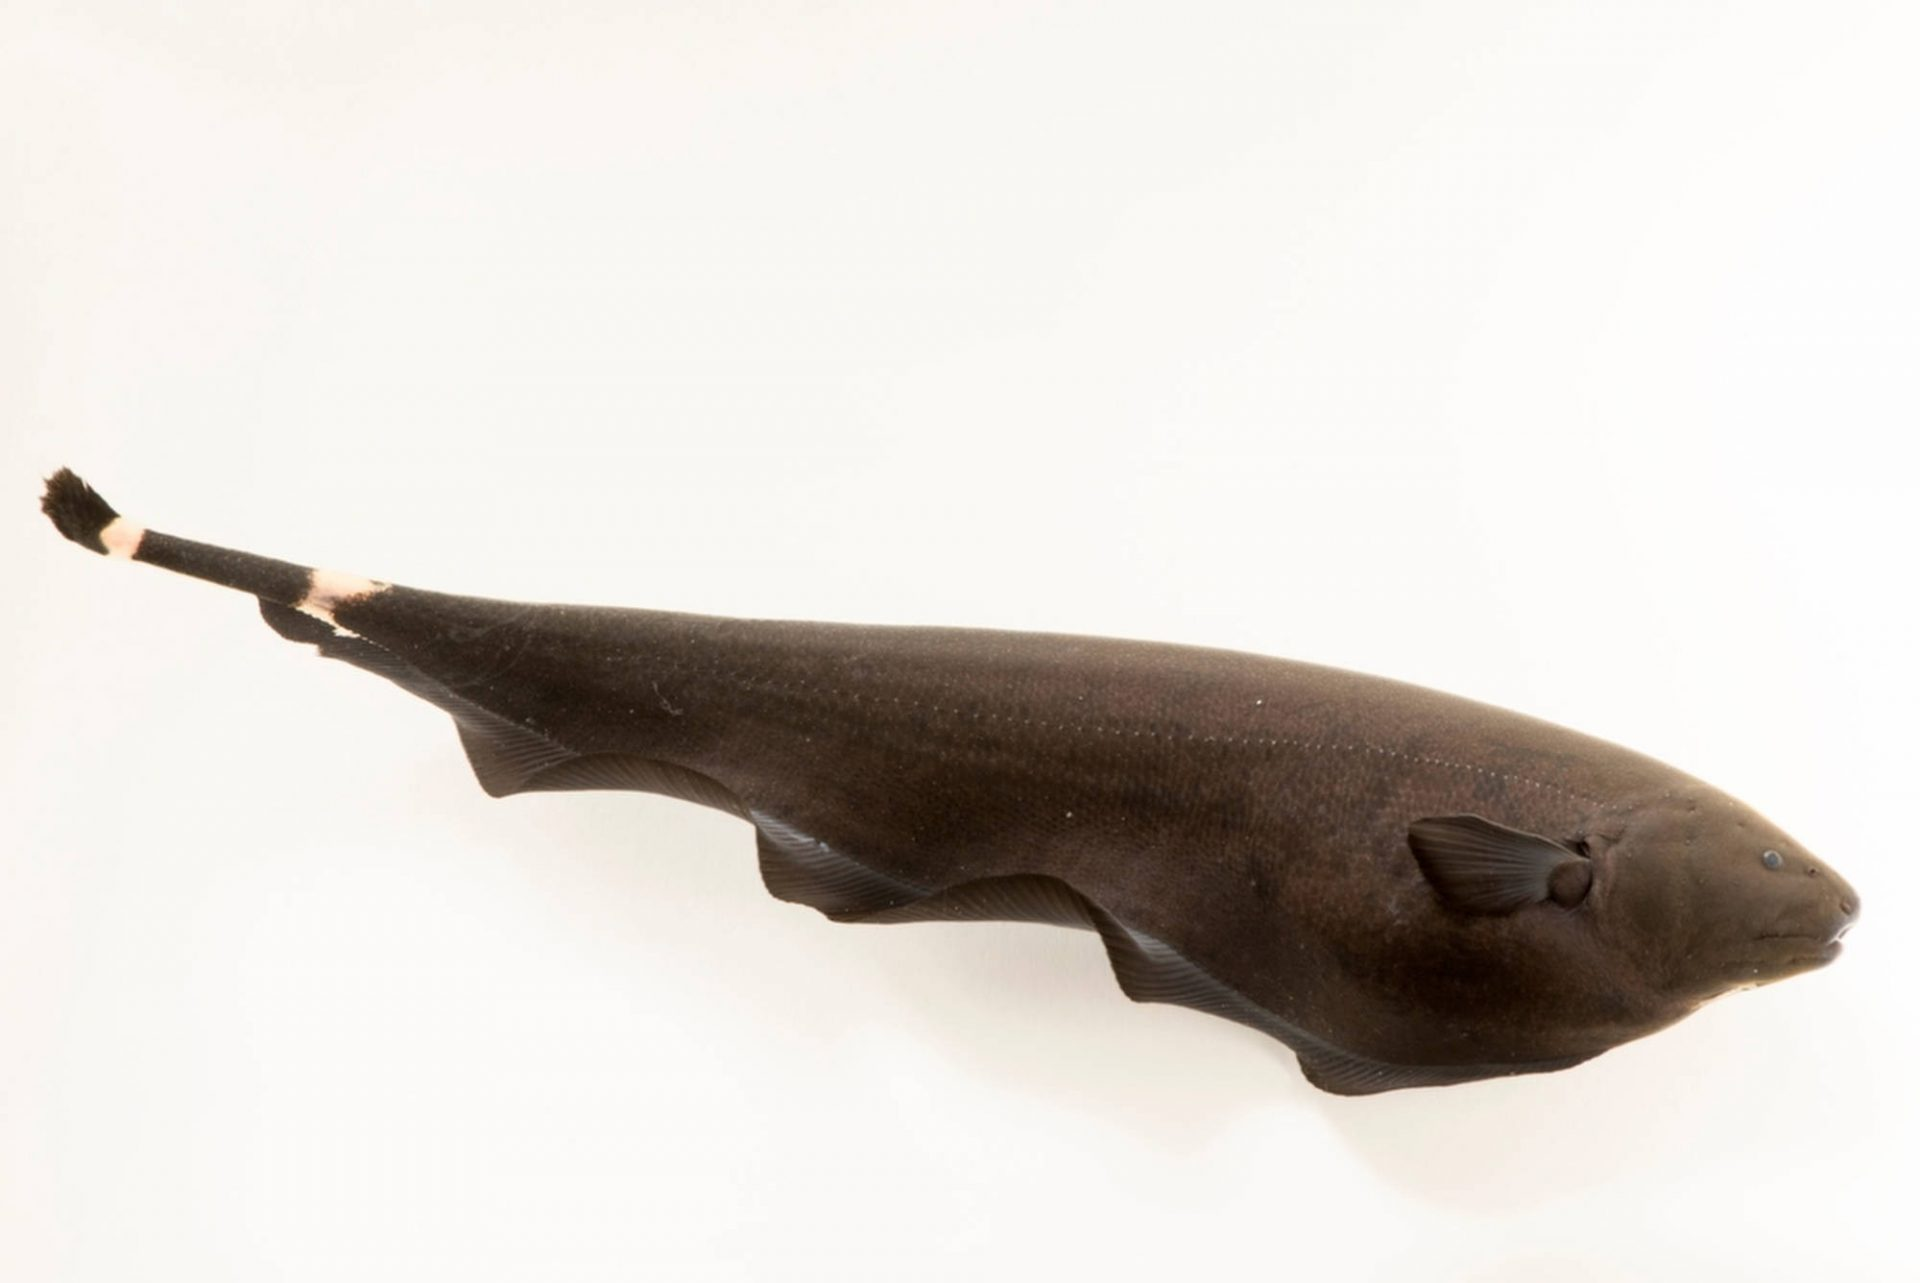 Photo: A black ghost knife fish (Apteronontus albifrons) at River Safari, part of Wildlife Reserves Singapore.